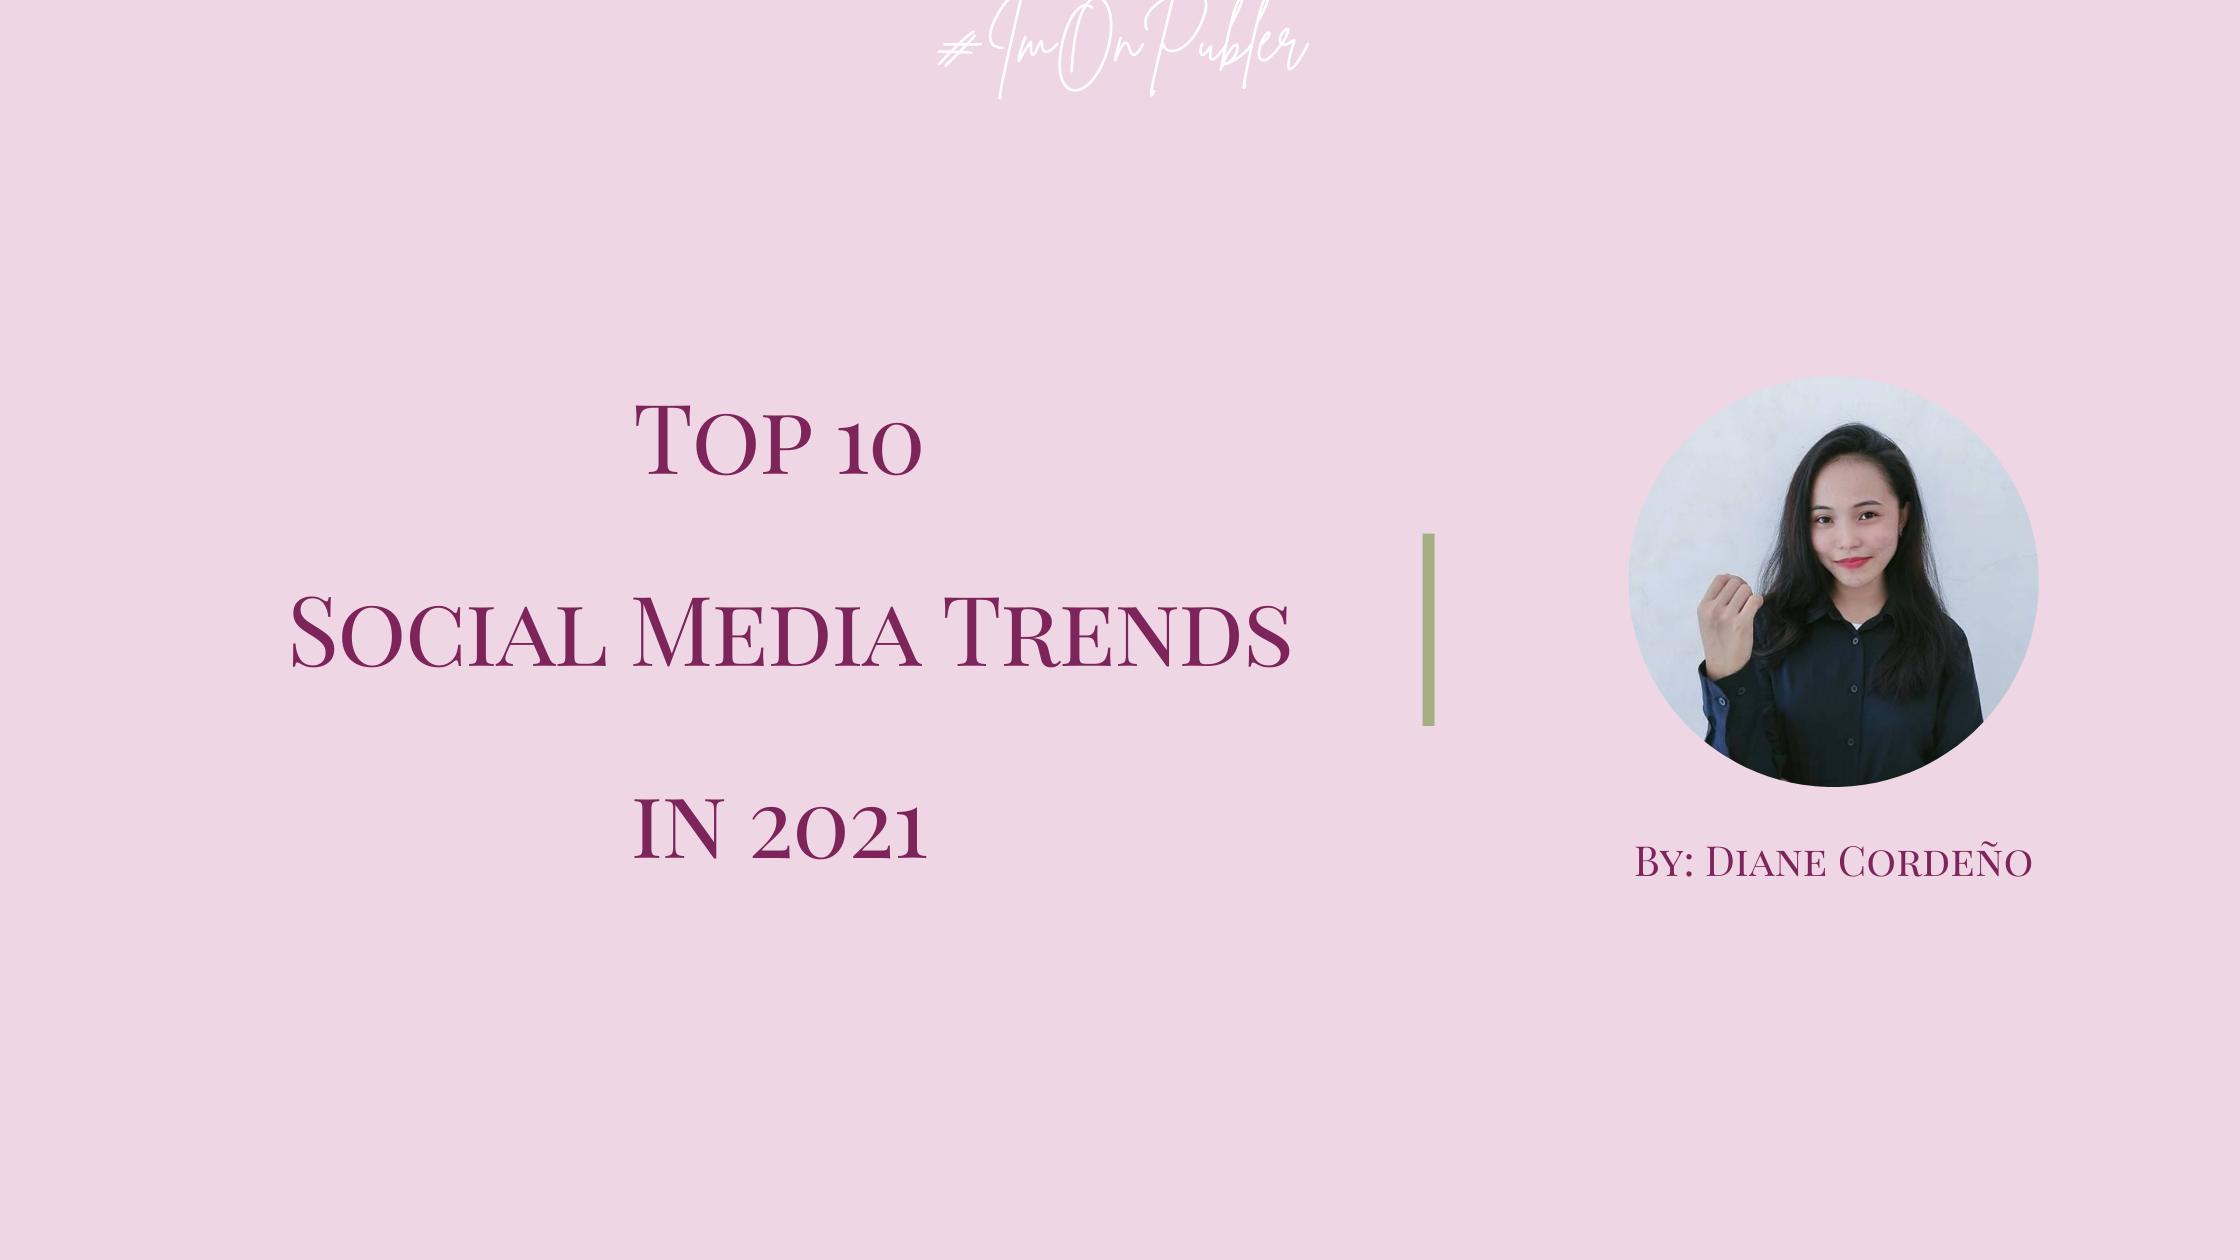 Top 10 Social Media Trends in 2021 by Diane Cordeño